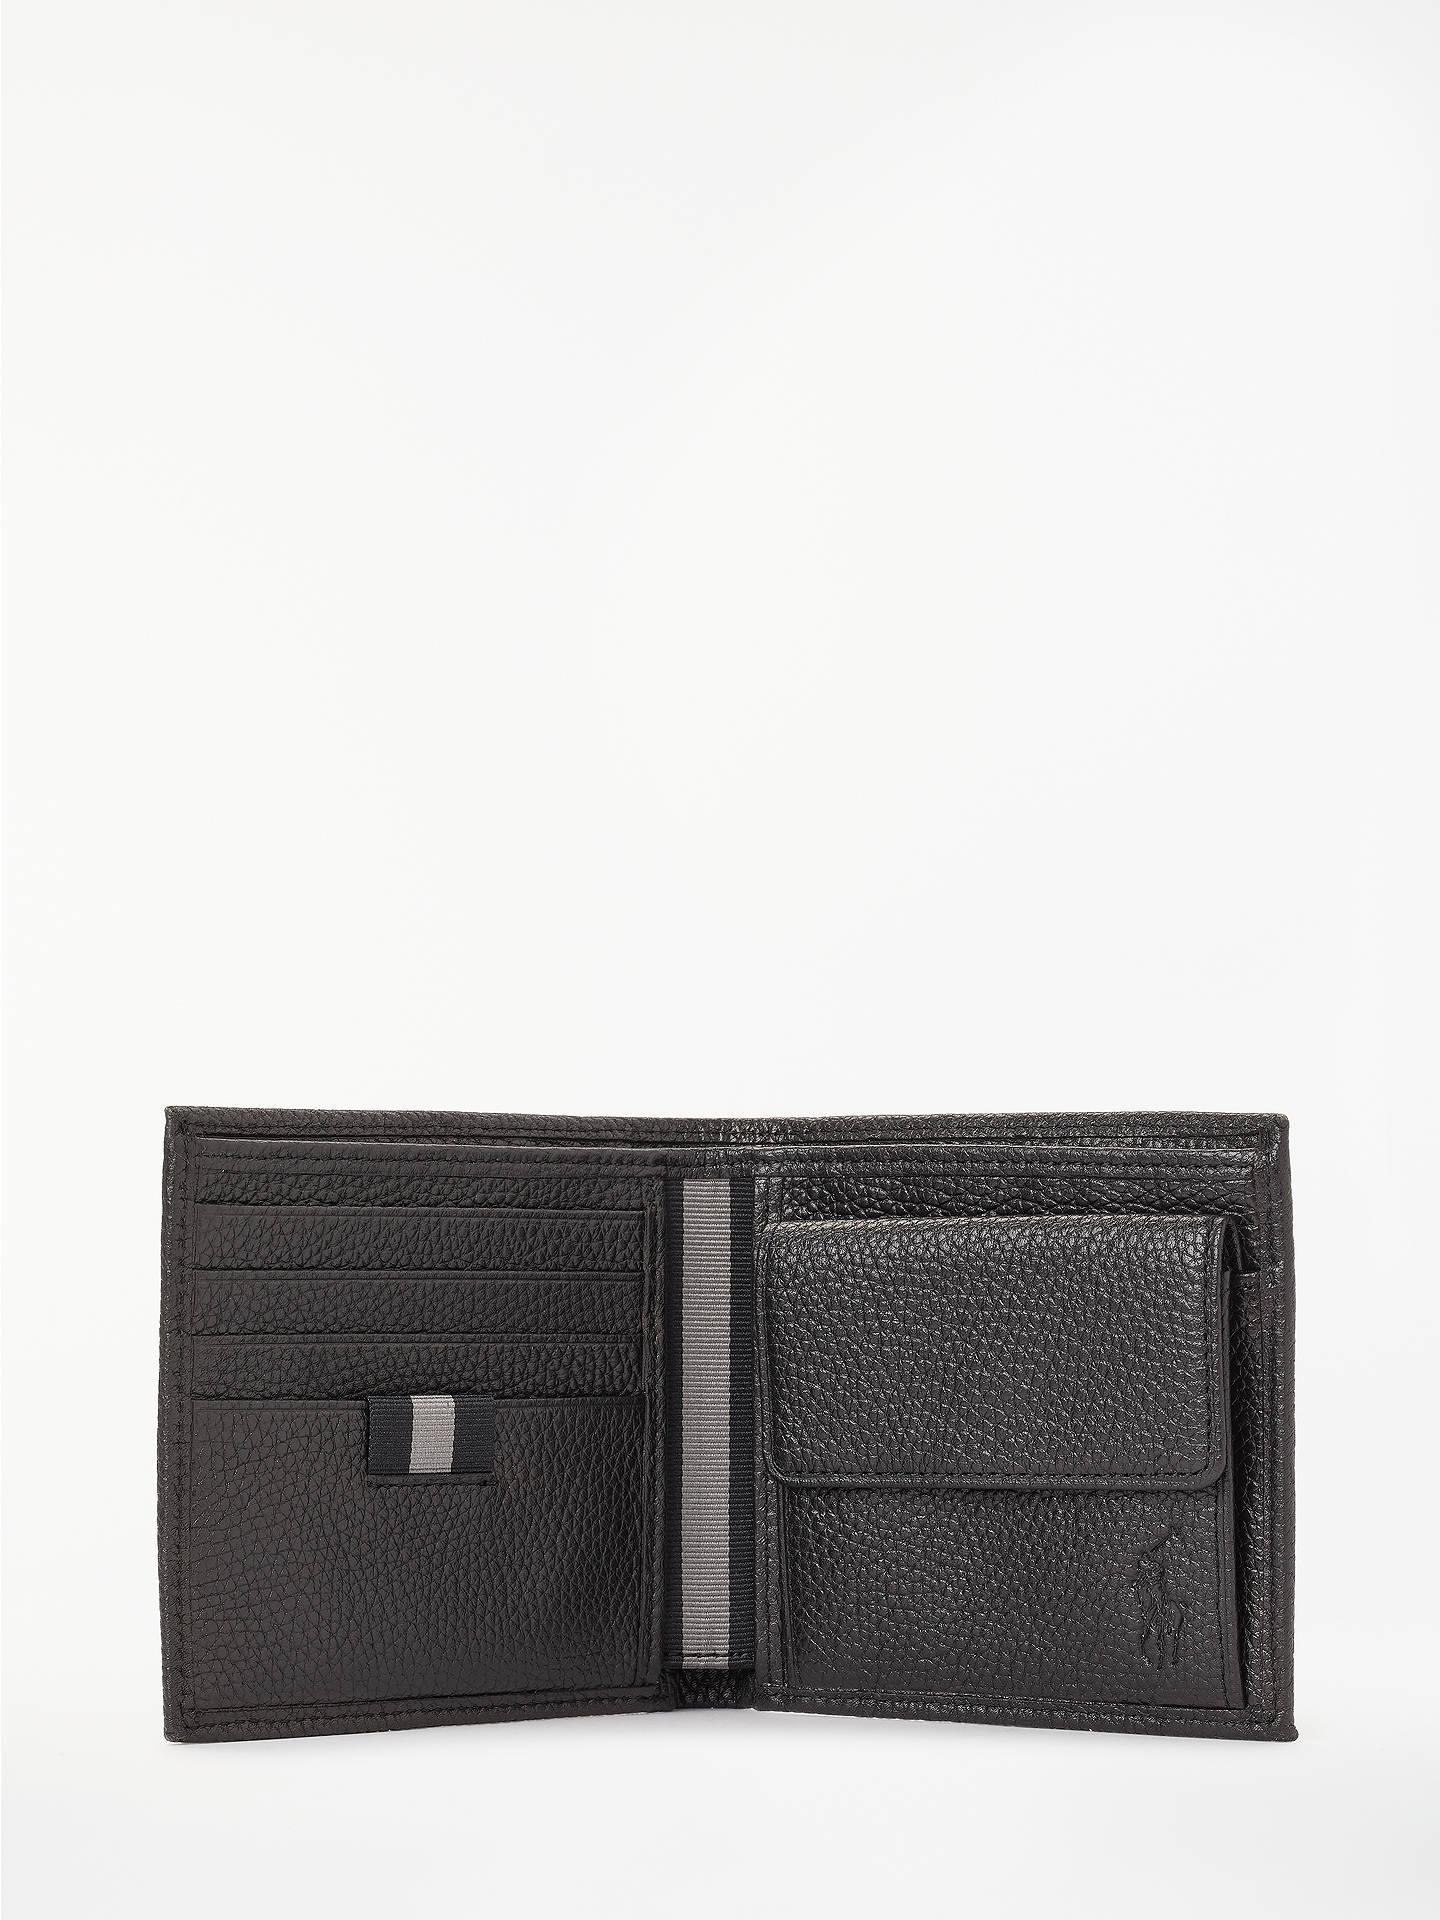 dc28cef16b1d ... Buy Polo Ralph Lauren Pebble Leather Coin Wallet, Black Online at  johnlewis.com ...